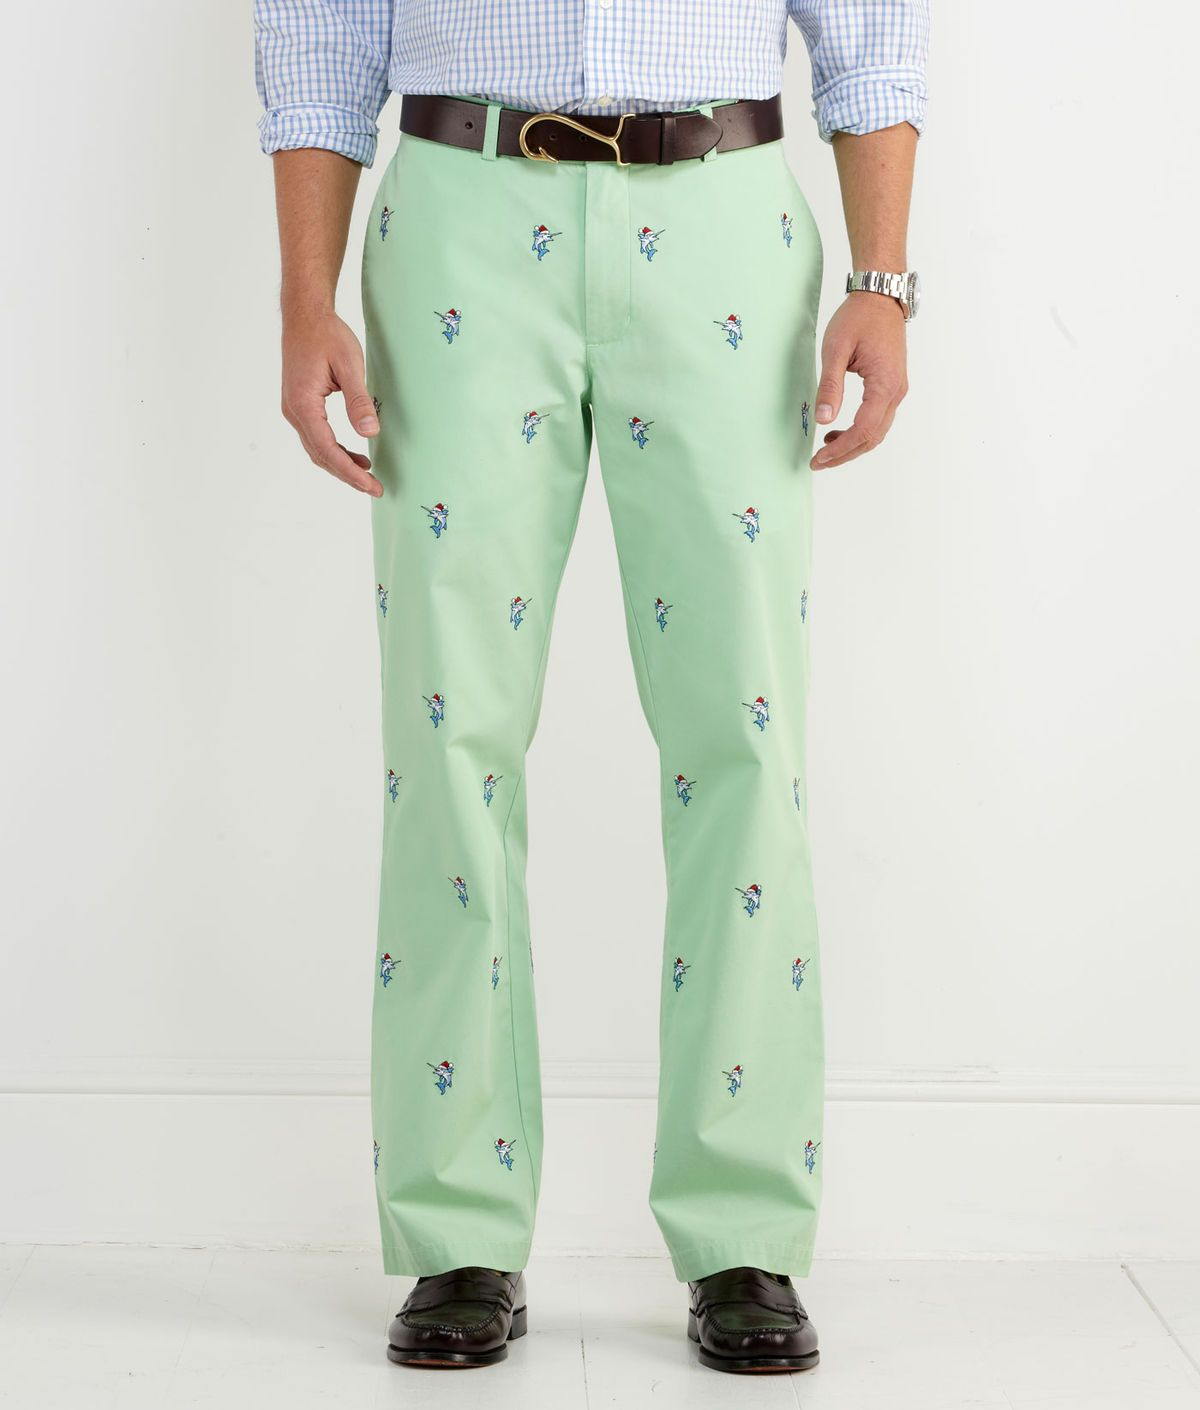 2ddc5526410 Holiday Wear for Men: Embroidered Santa Marlin Club Pants for Men -  Vineyard Vines